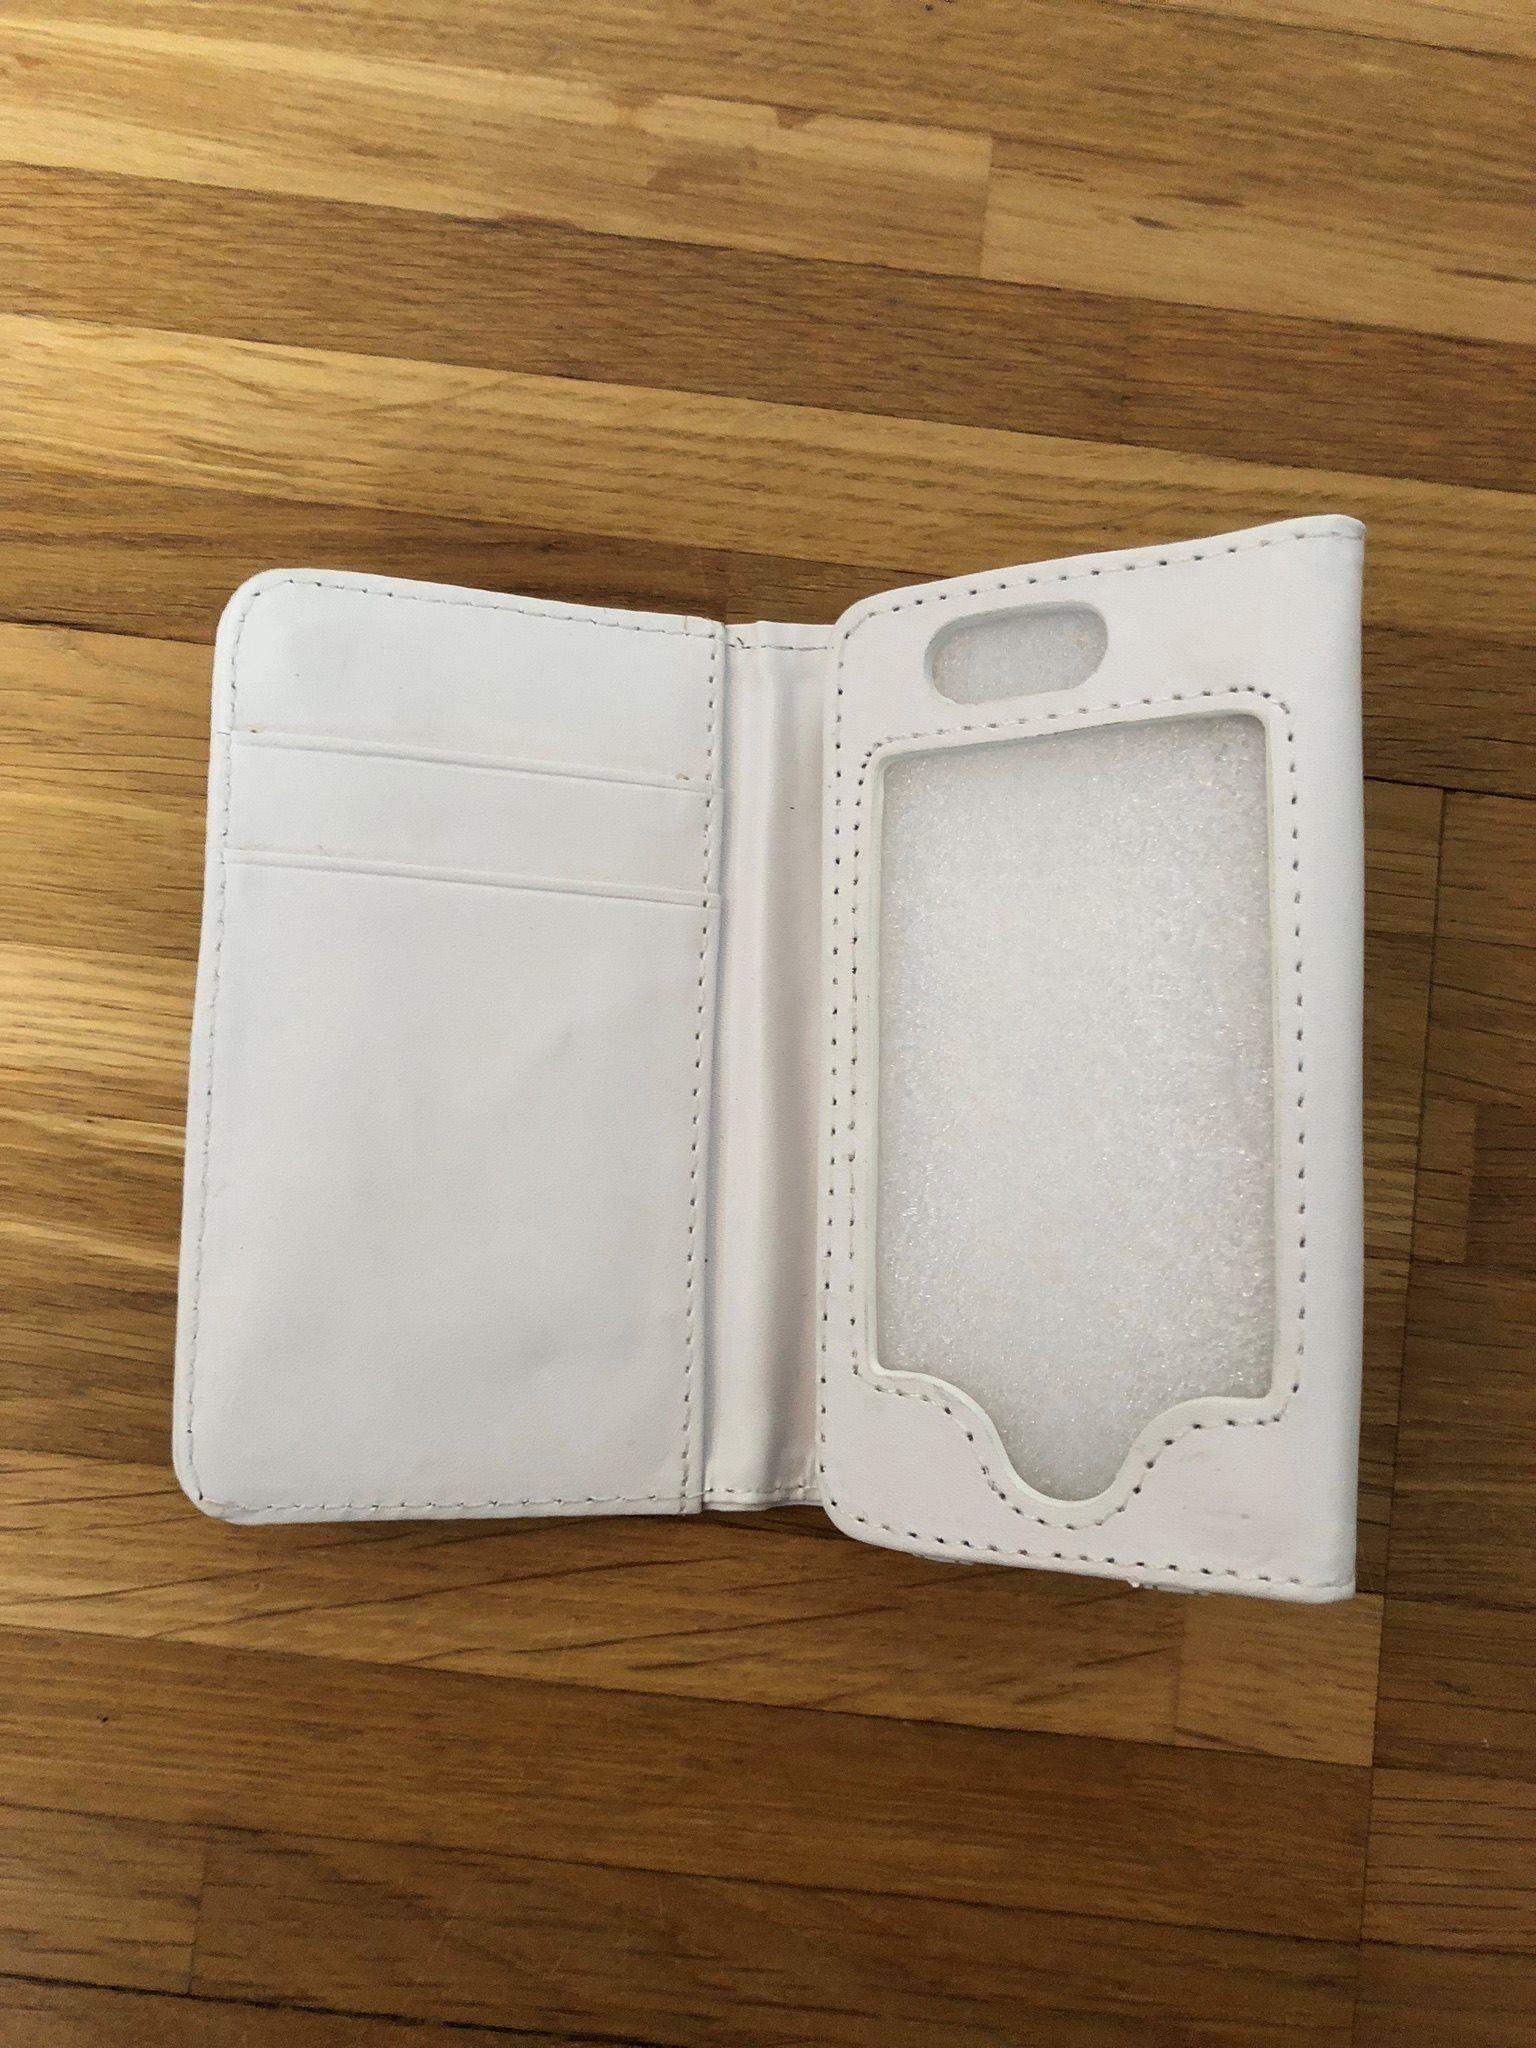 Plånboksfodral iPhone 4 4S (341617800) ᐈ Köp på Tradera ed0d7c5b3c5d3